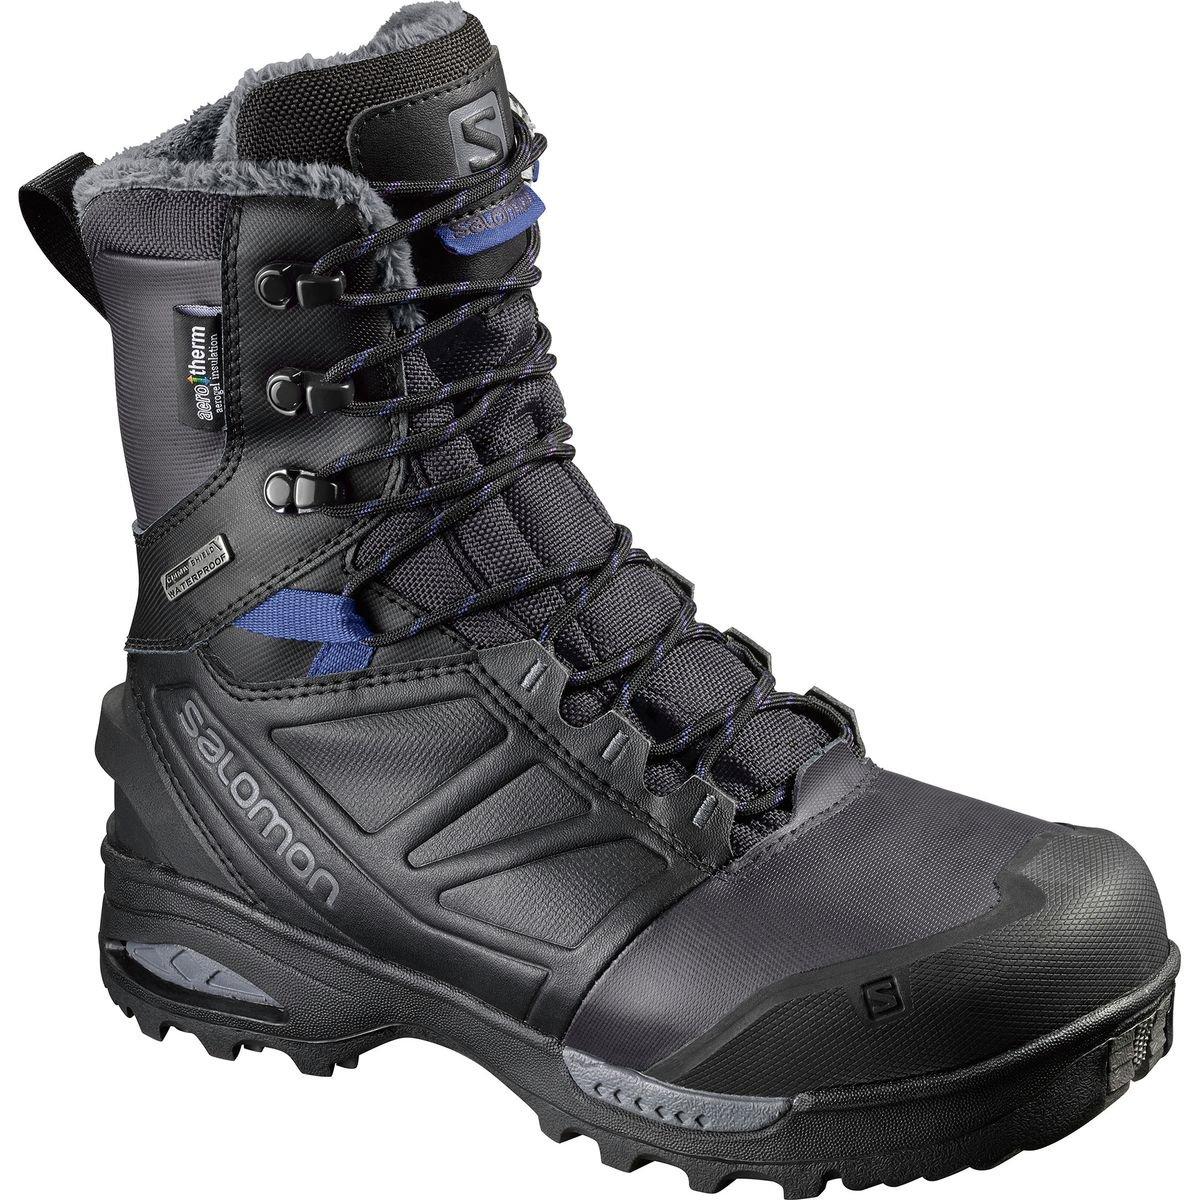 Salomon Women's Toundra Pro CSWP W Snow Boot, Phantom/Black/Amparo Blue, 9 M US by Salomon